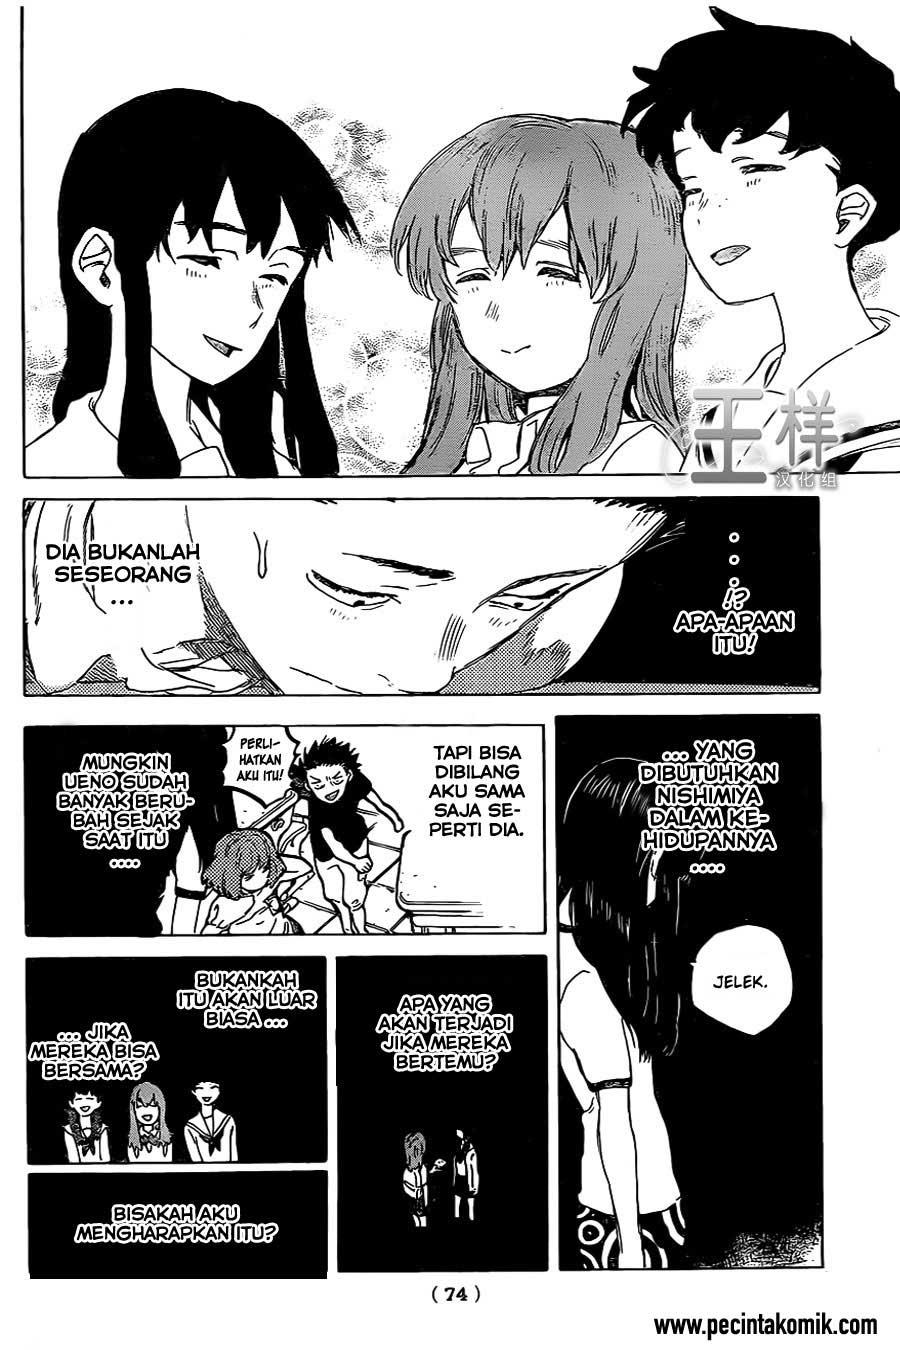 Koe no Katachi Chapter 19-7